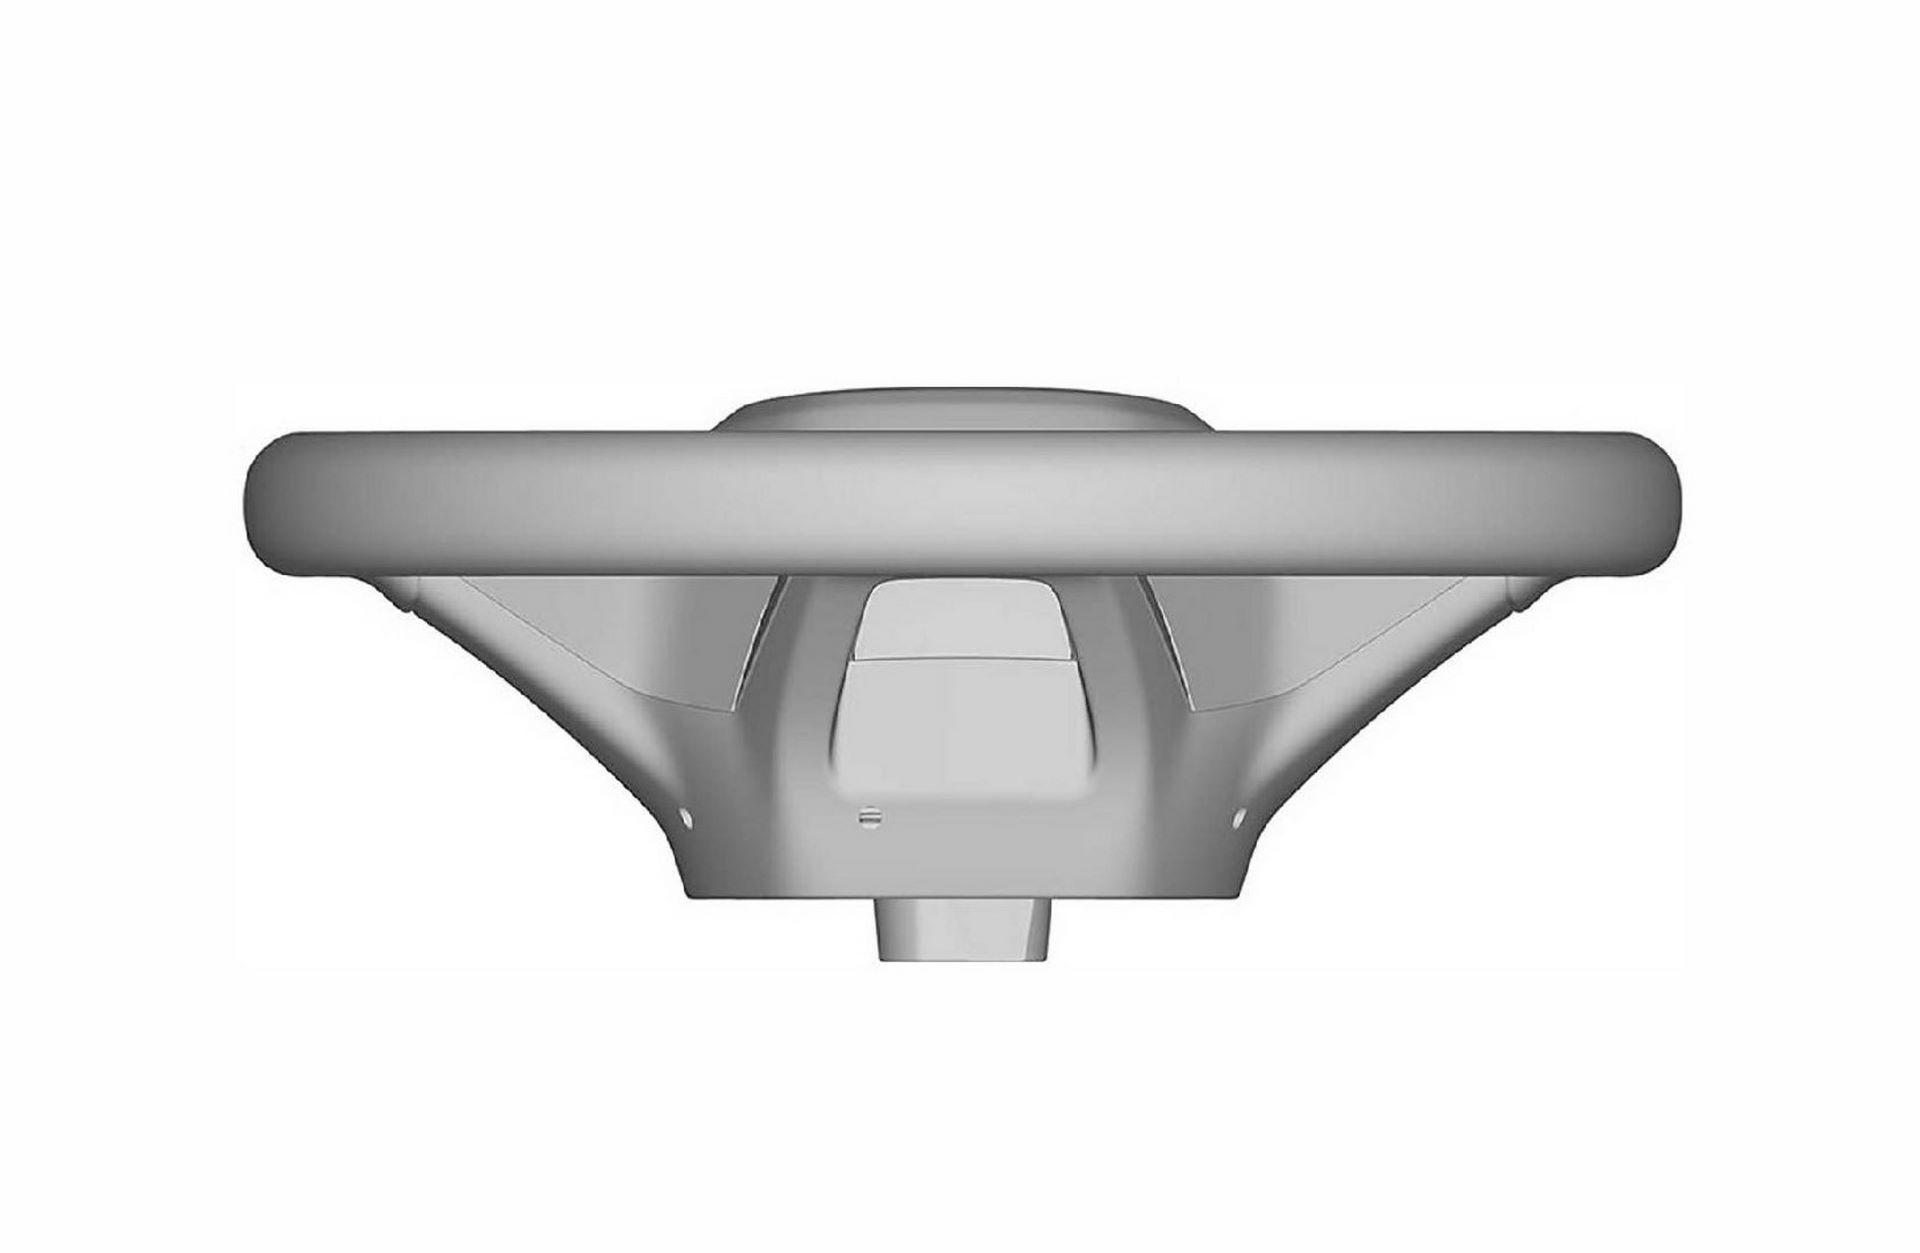 New-Honda-Civic-interior-patent-photos-16